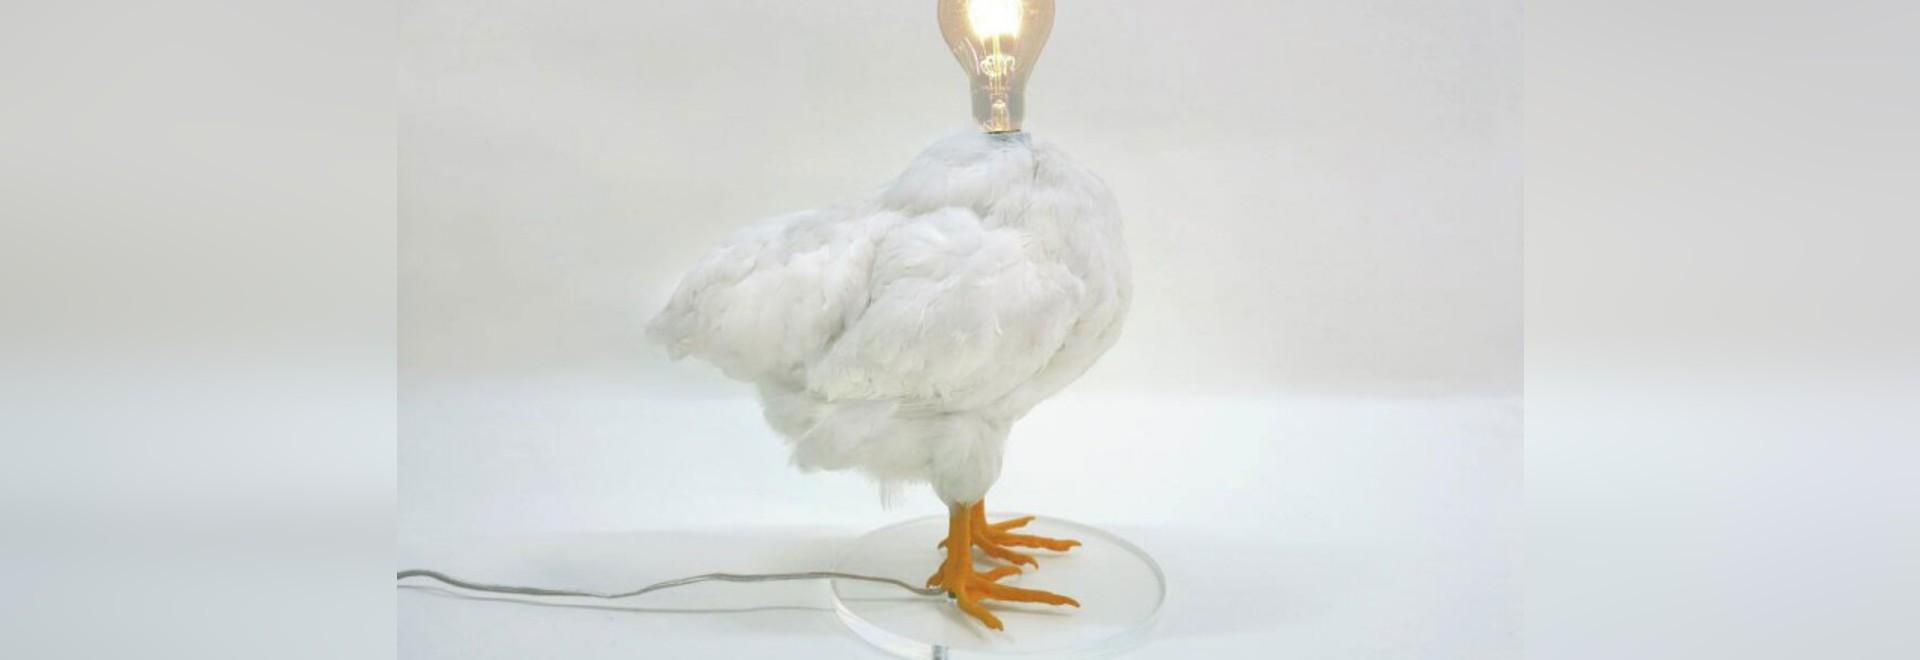 CHICKEN LAMP BY SEBASTIAN ERRAZURIZ